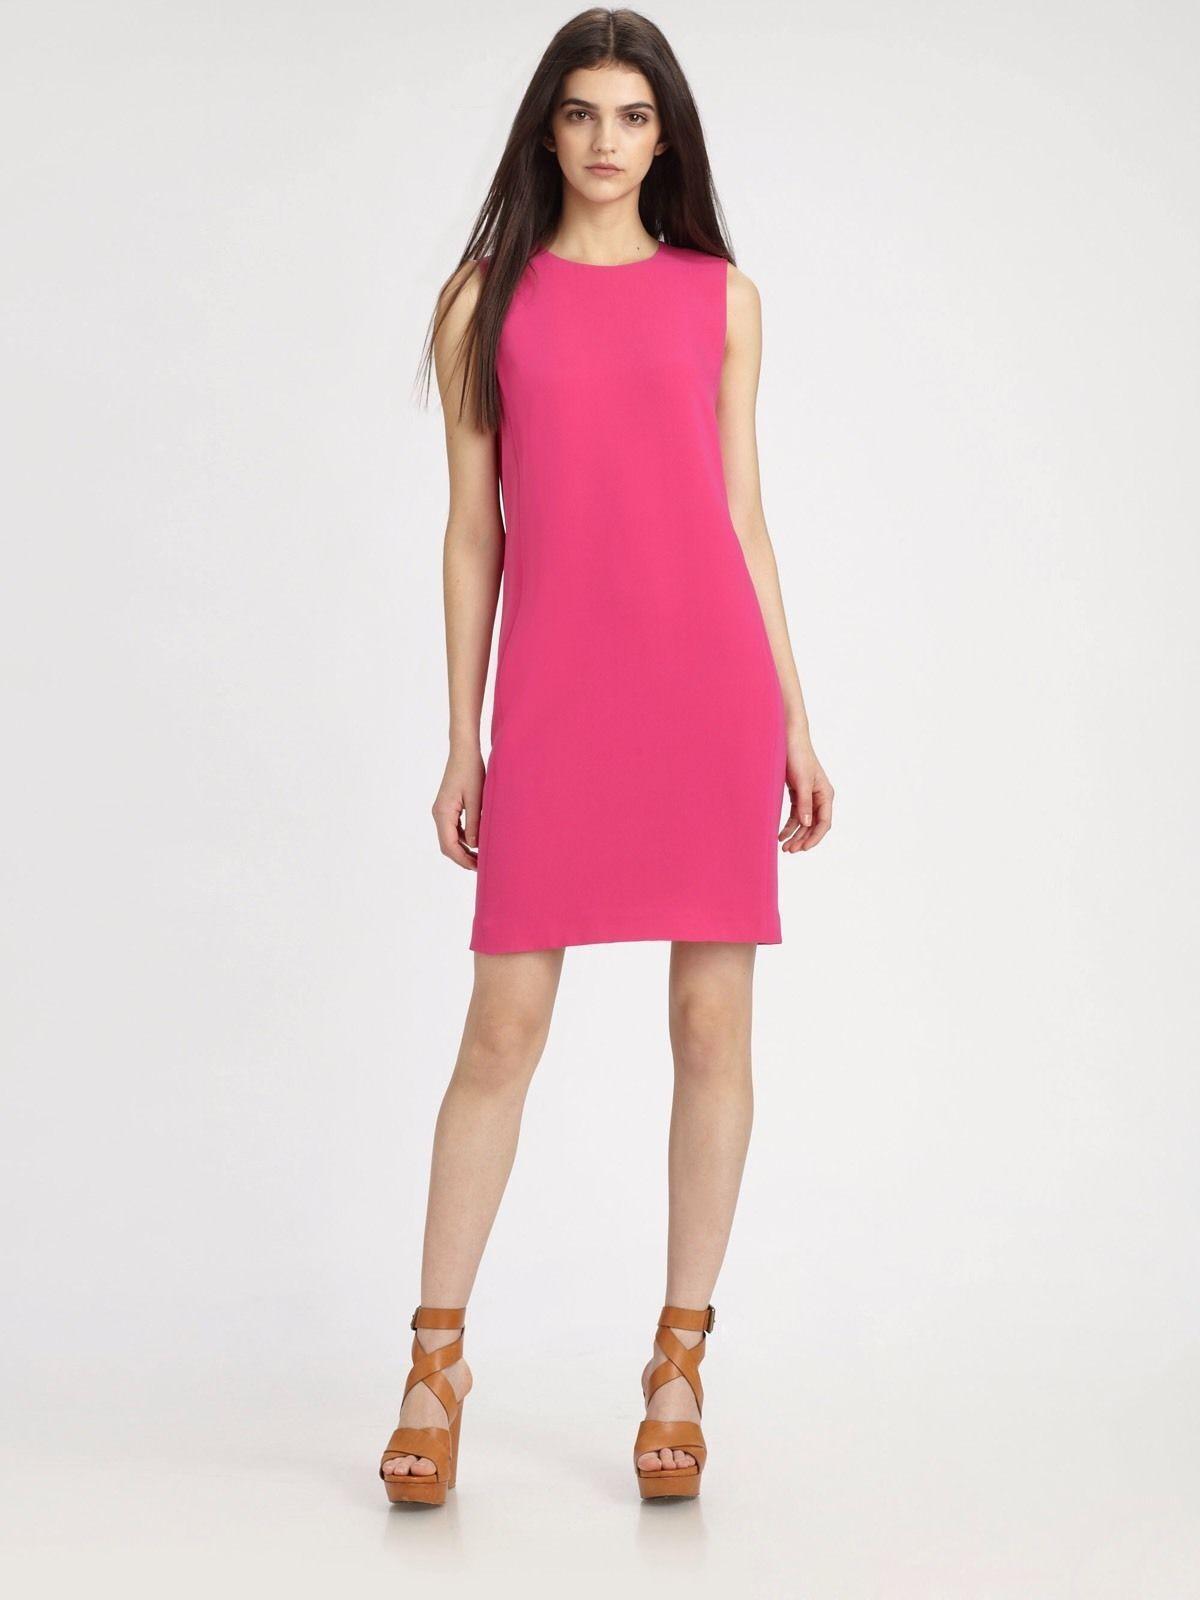 NWOT VINCE Silk Shift Dress Rosa 10 Runs very Small